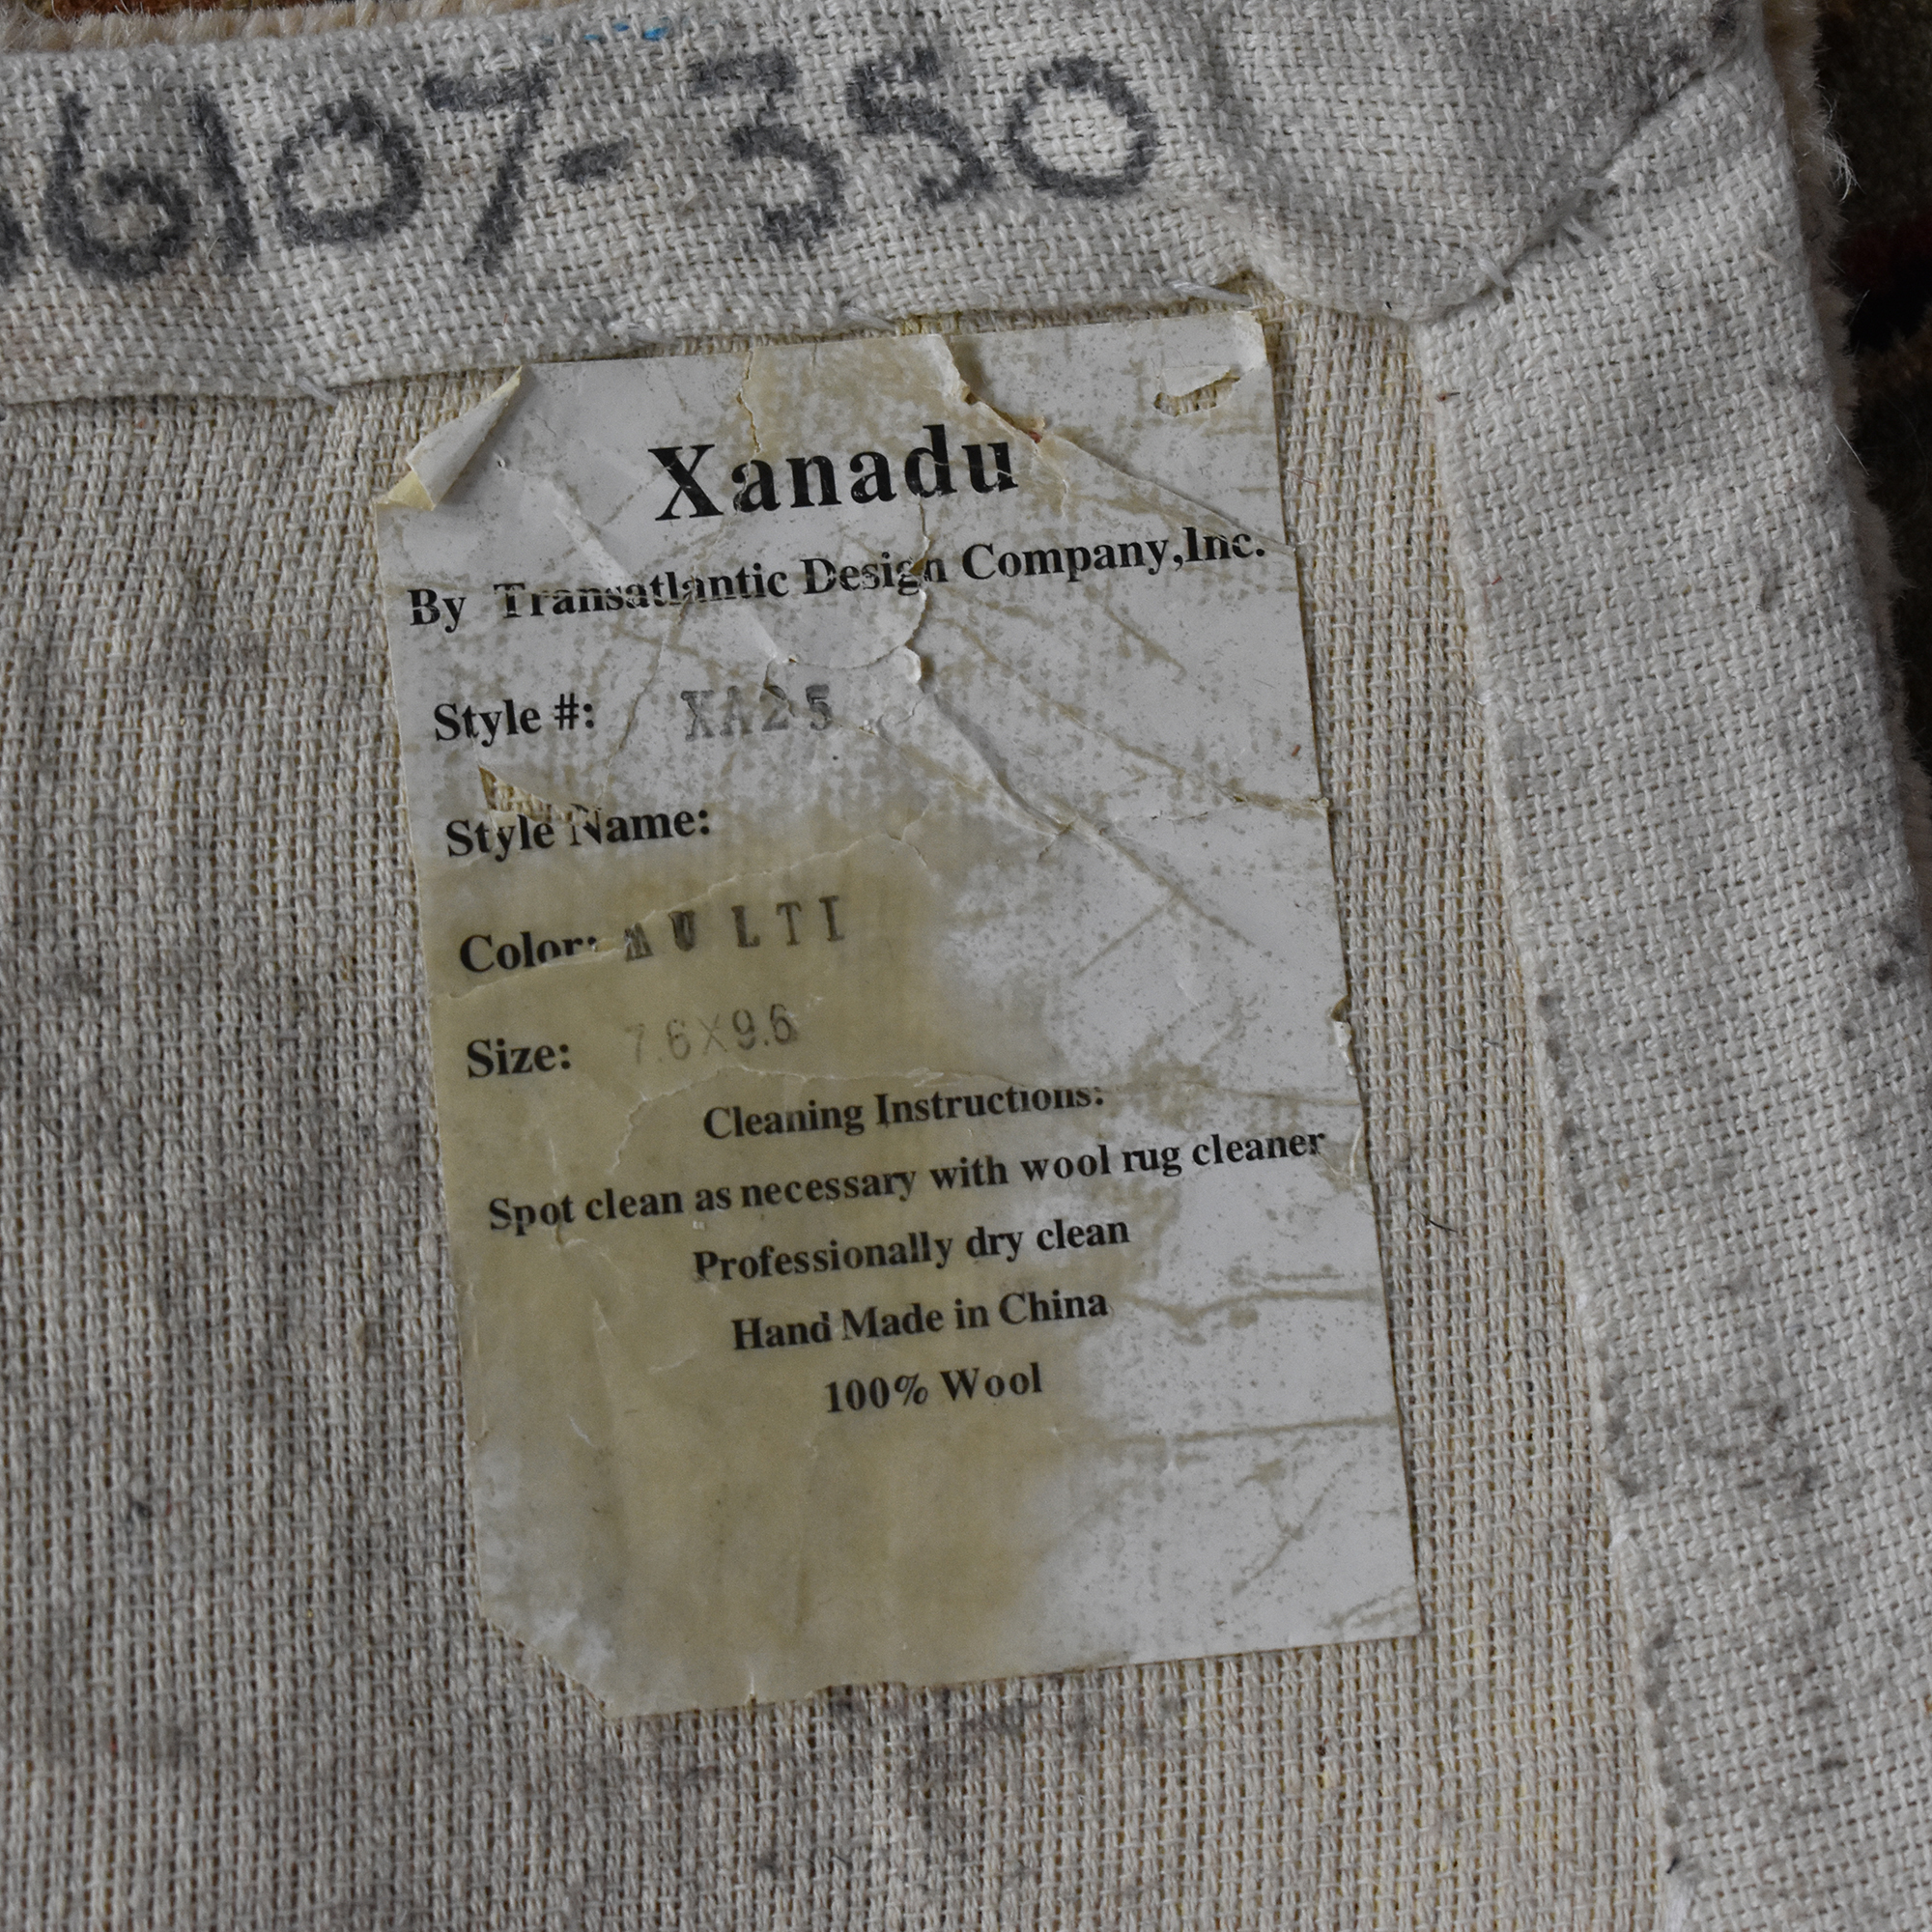 Transatlantic Design Company Transatlantic Design Company Xanadu Area Rug for sale